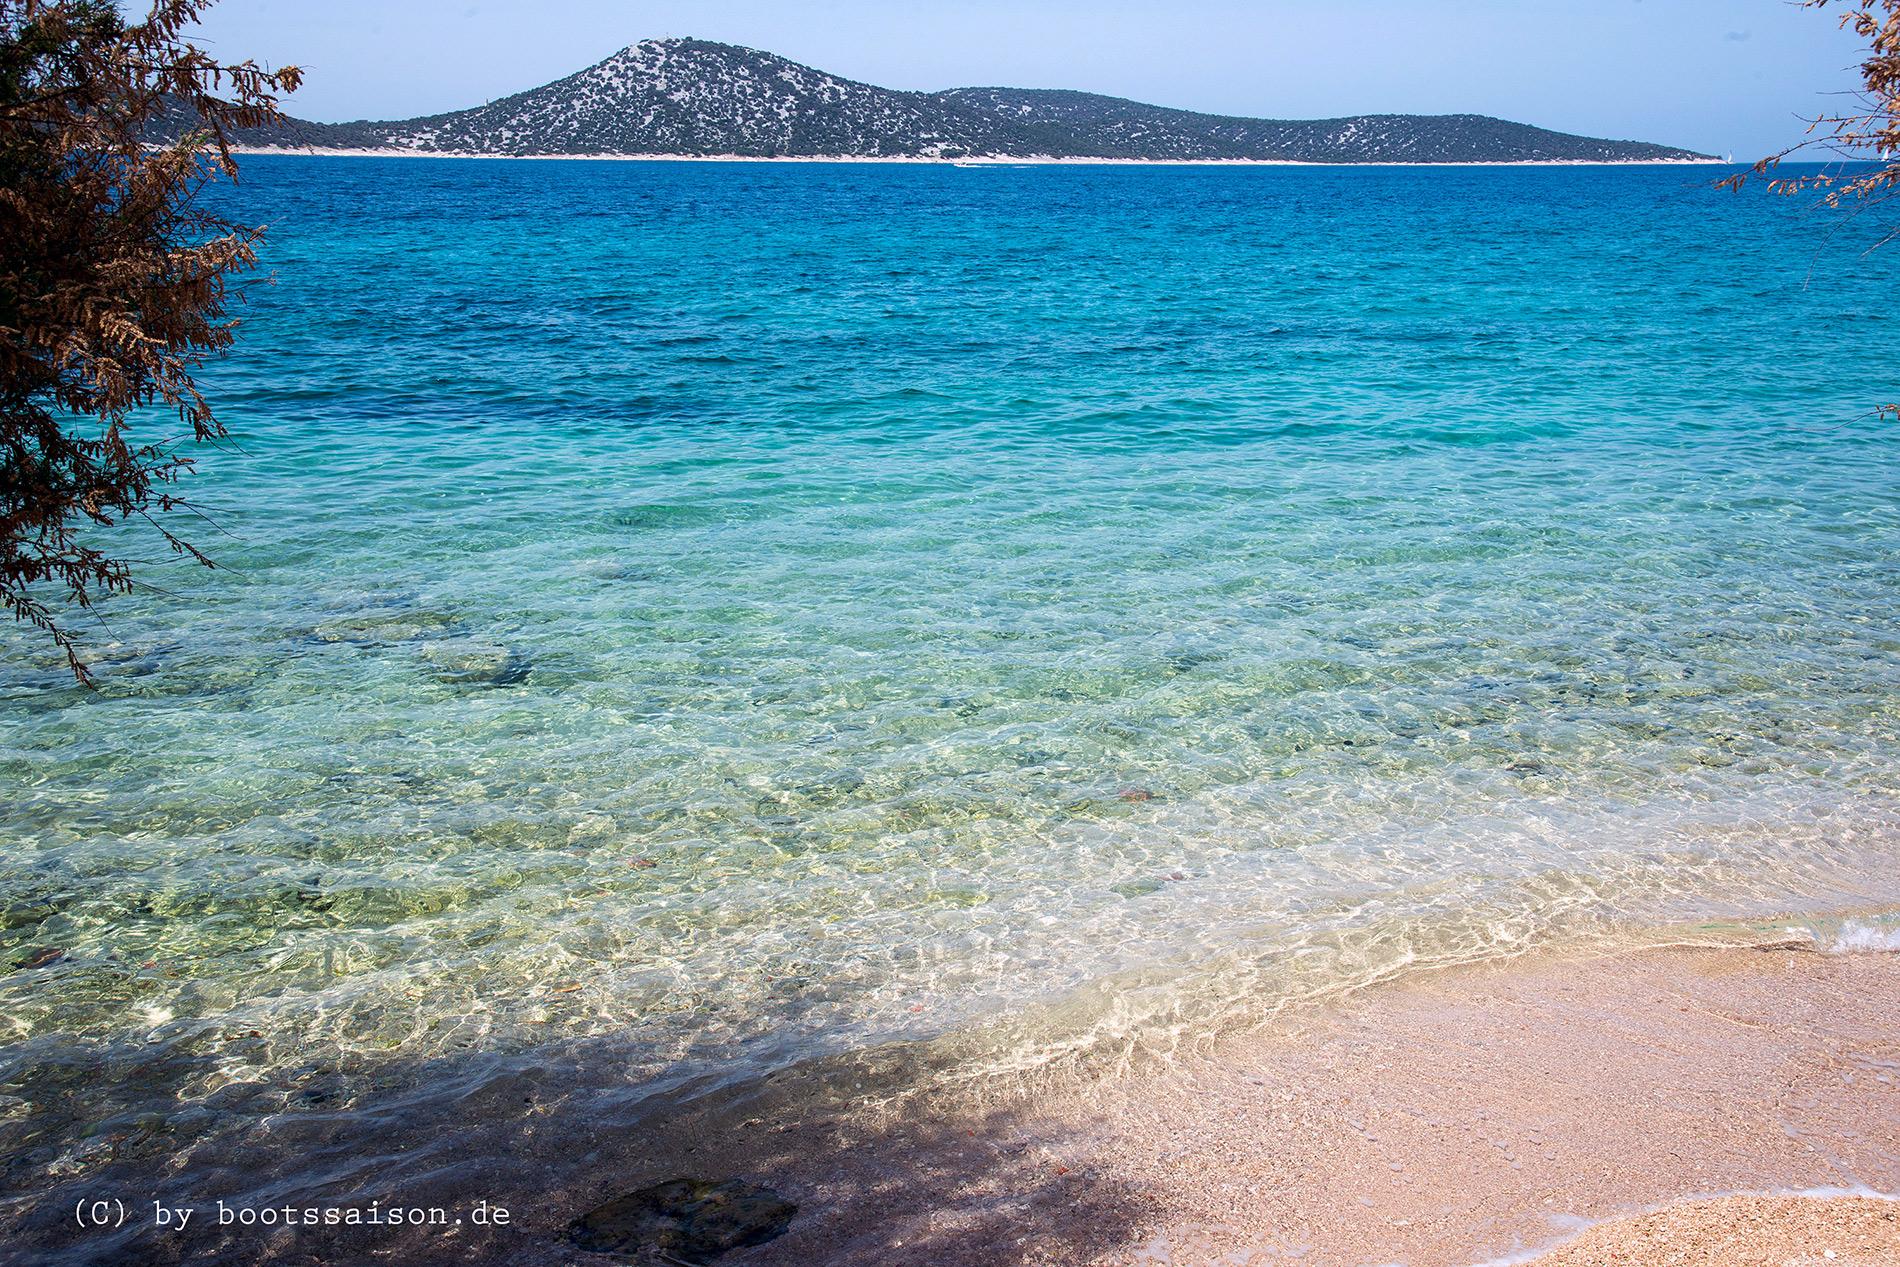 Strand auf der Insel Prvic